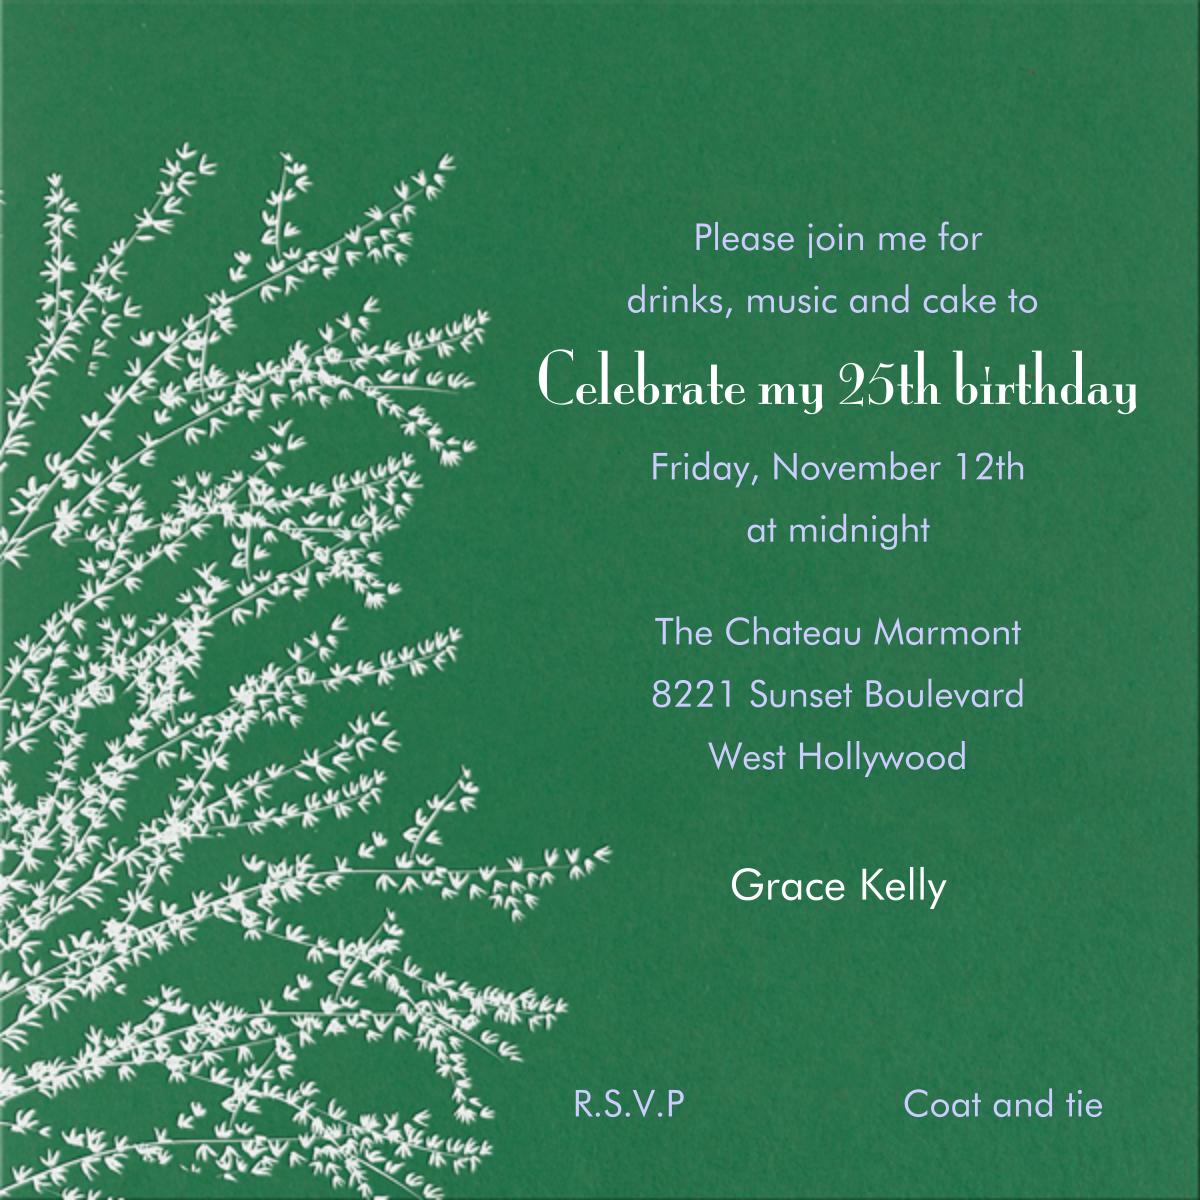 Forsythia - Moss - Paperless Post - Adult birthday